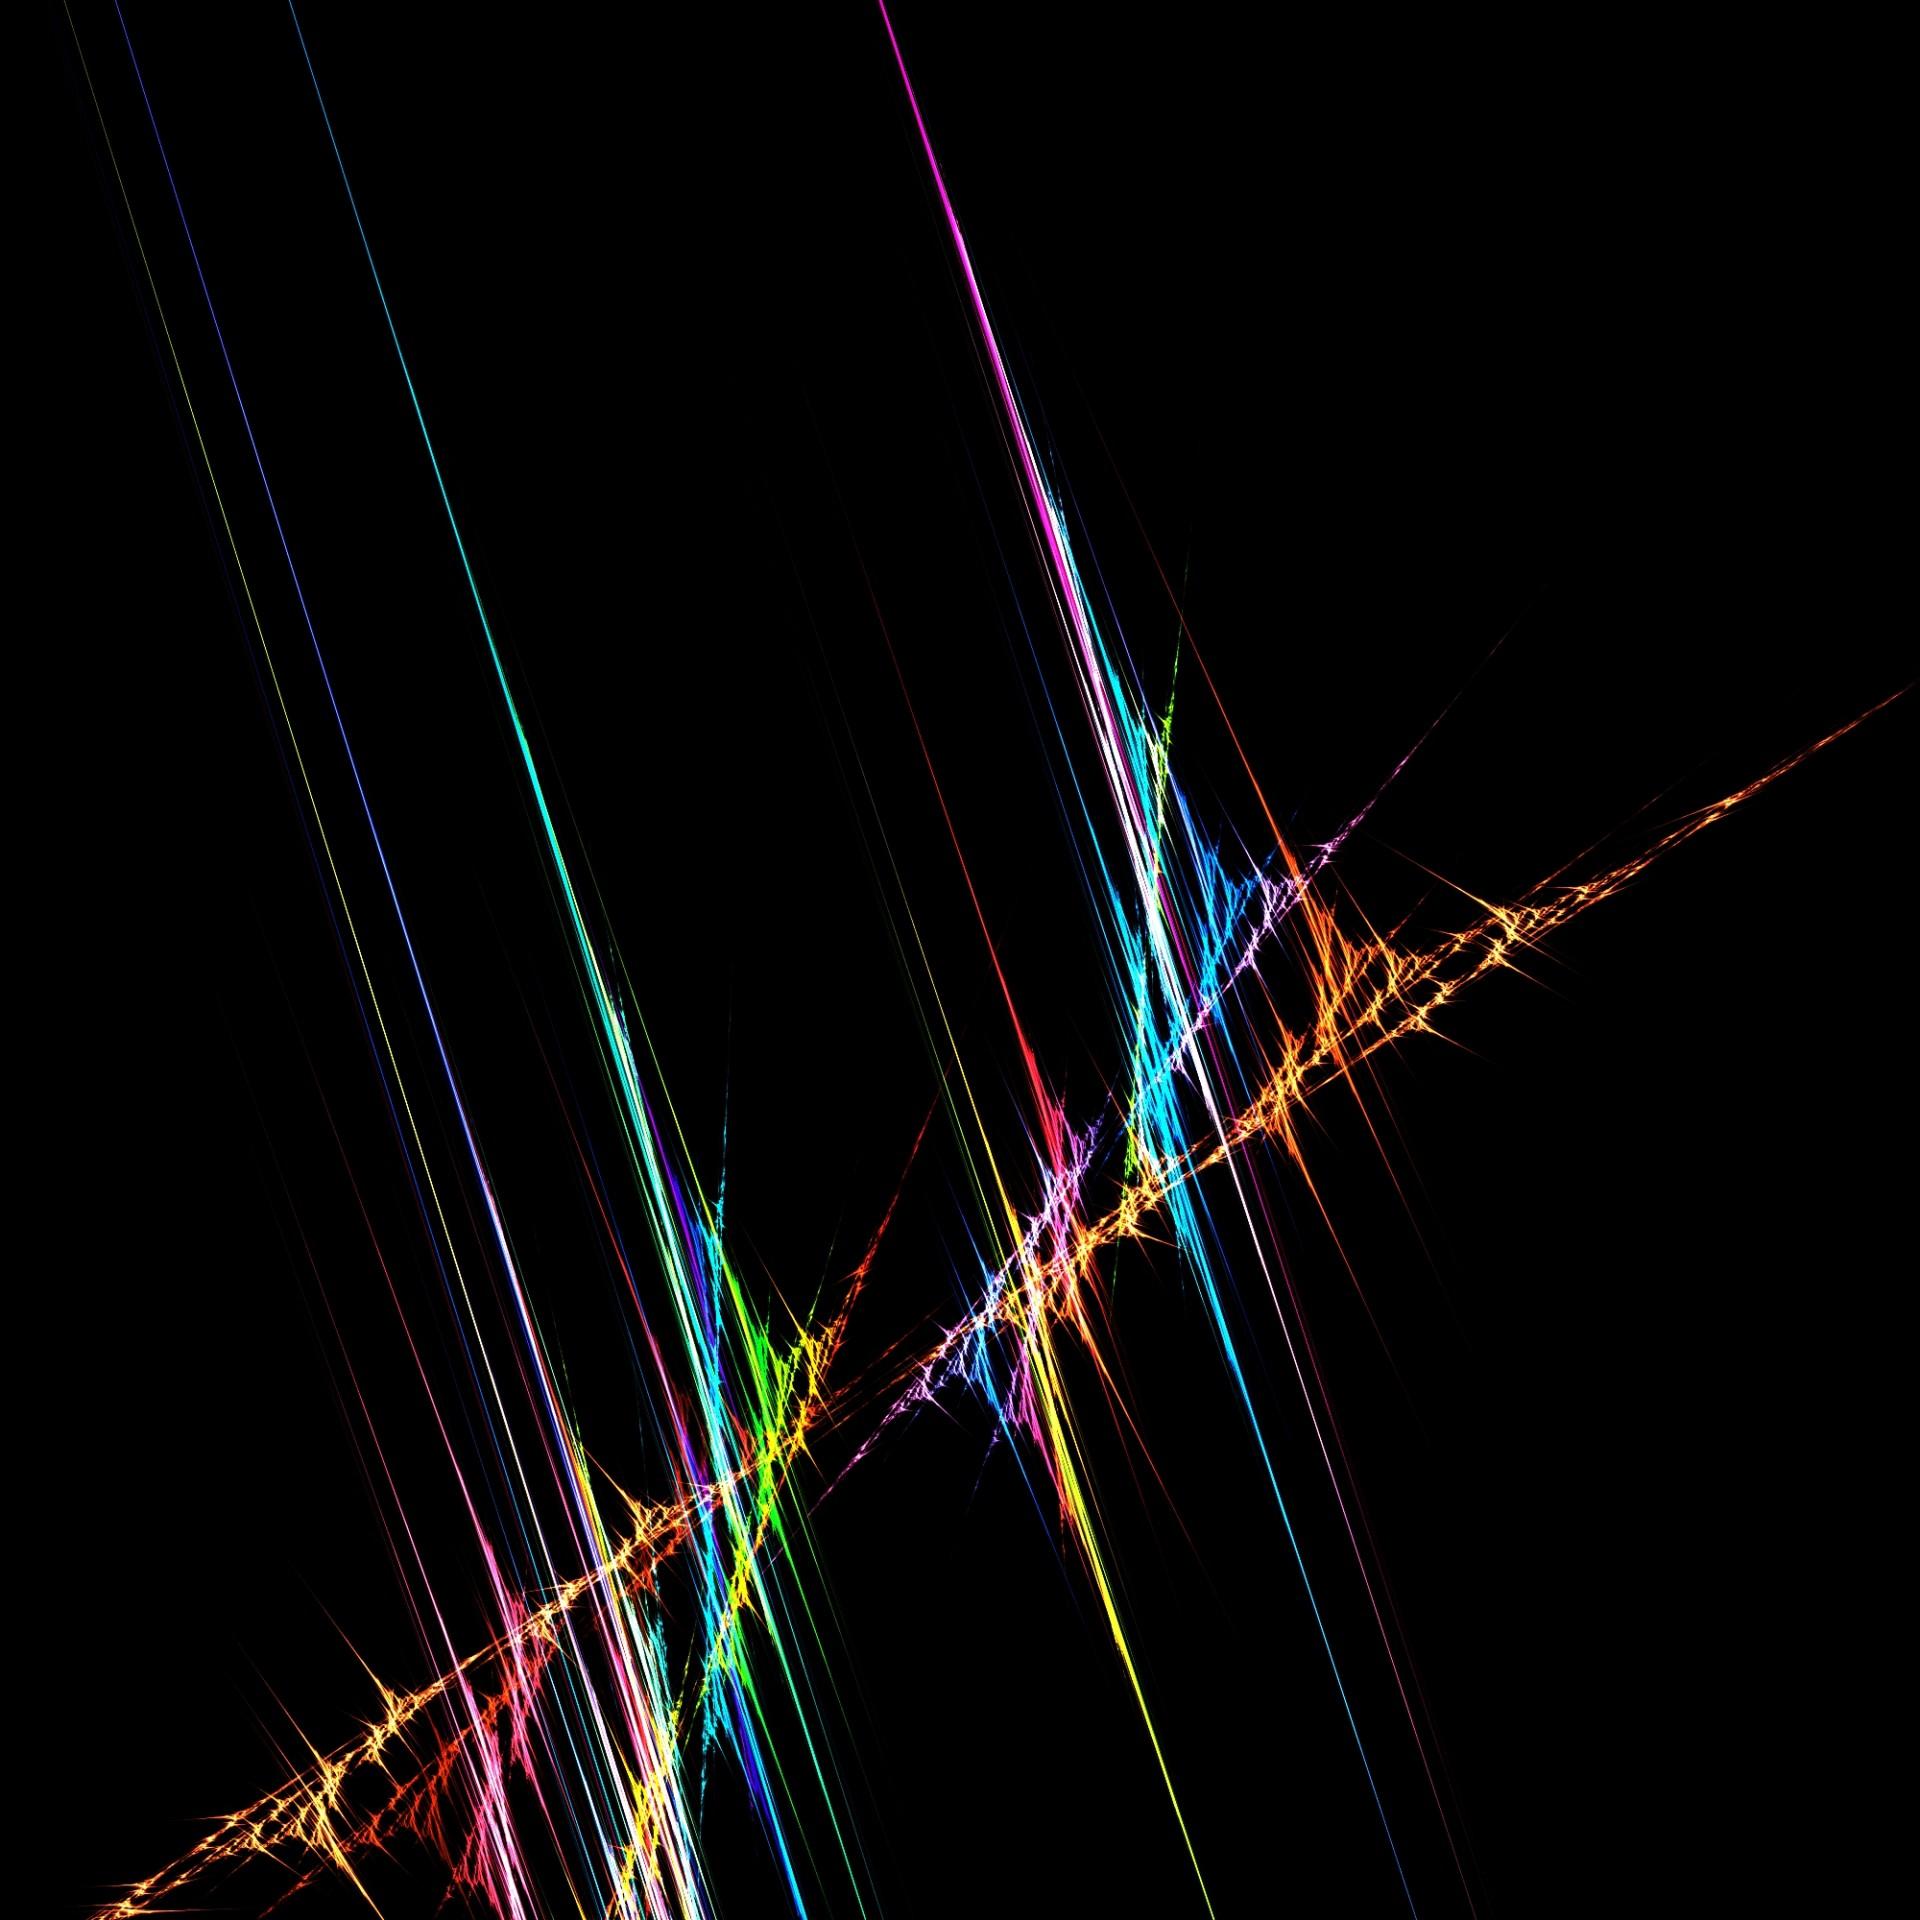 soundwaves.jpg